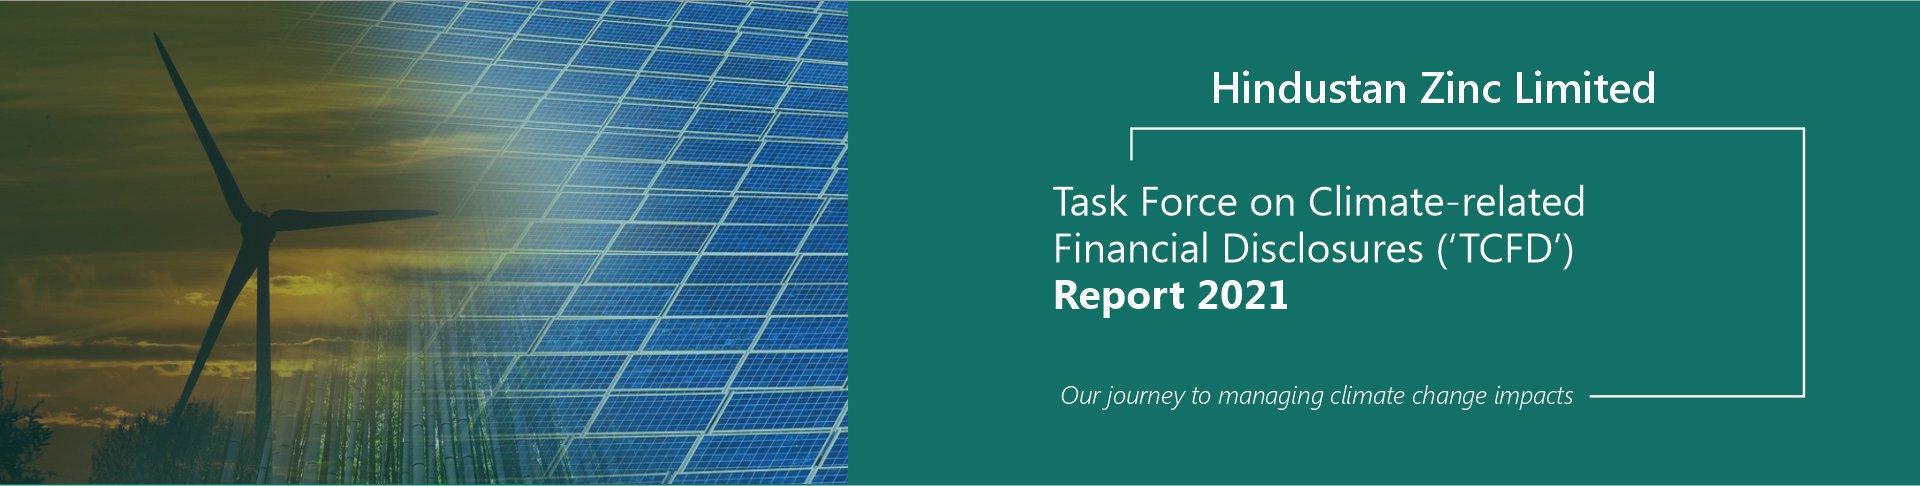 TCFD Report